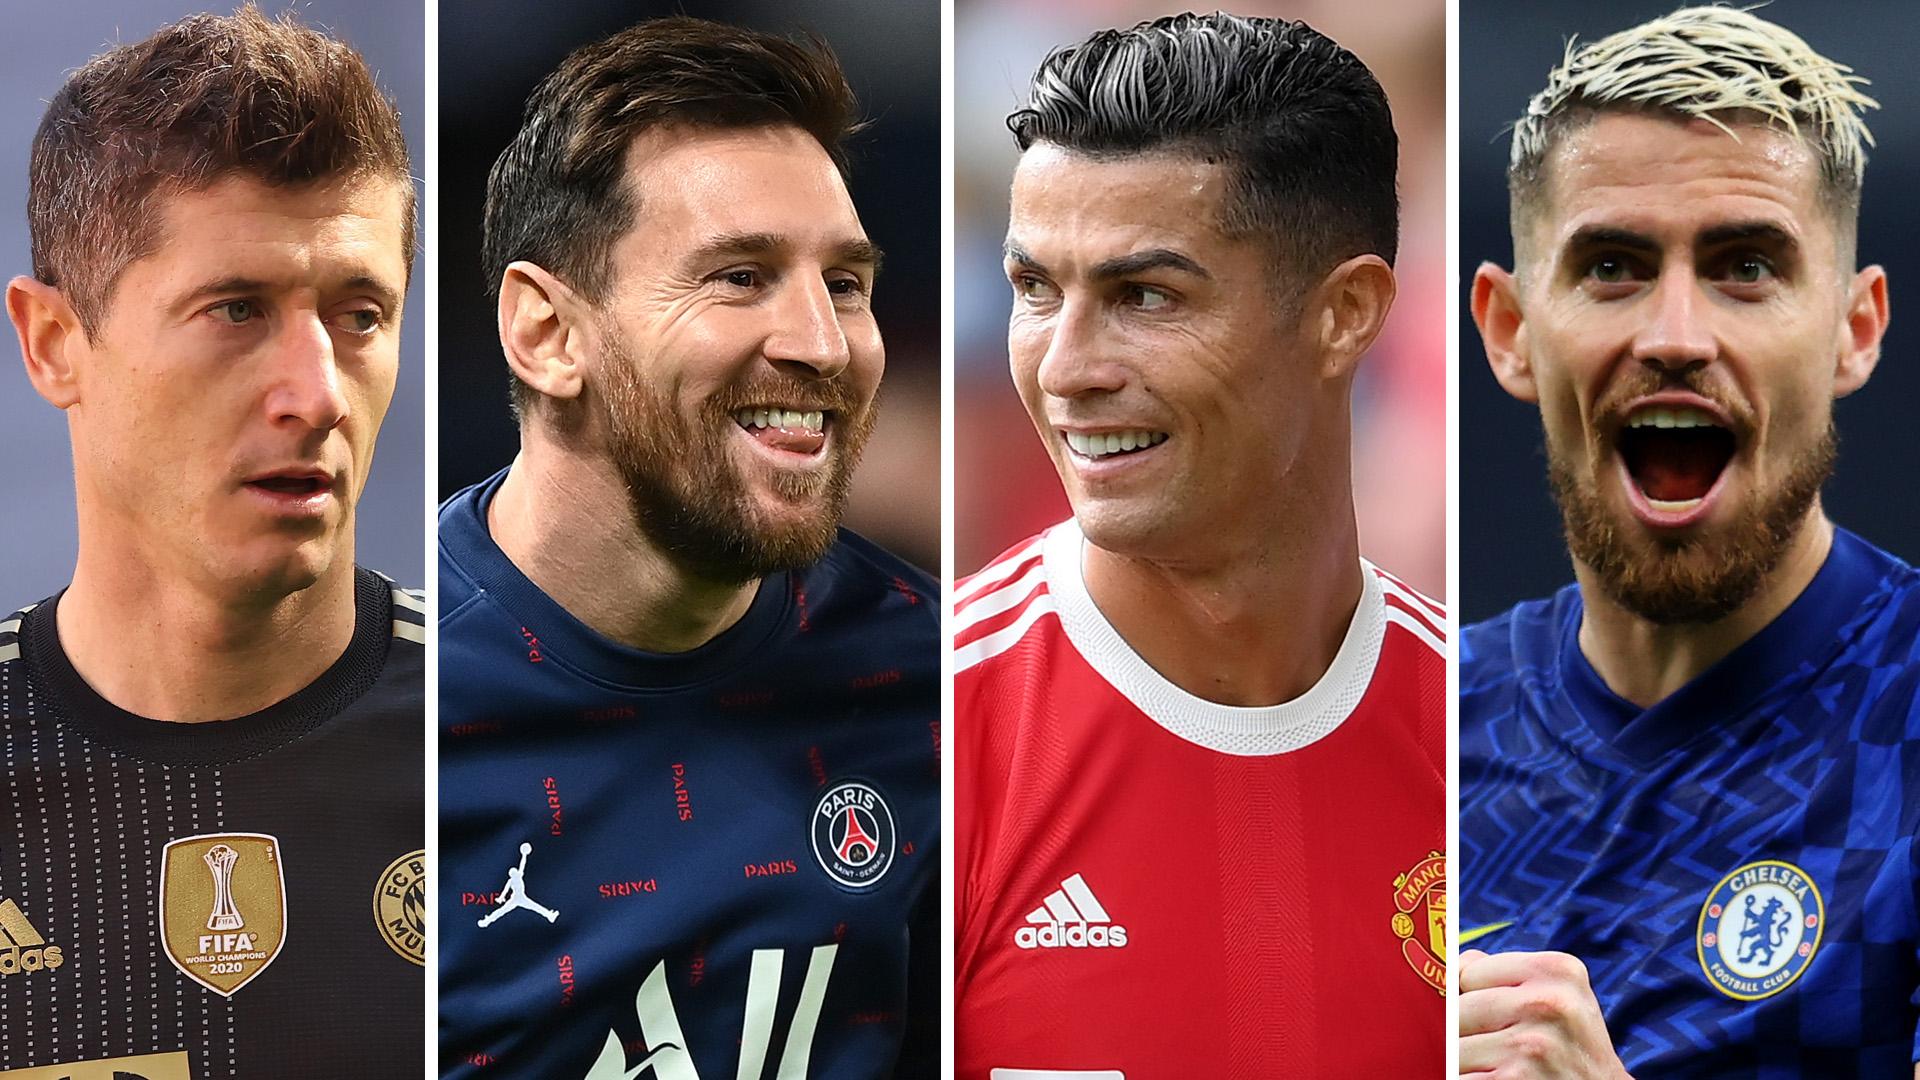 Ballon d'Or 2021 nominees: Messi, Ronaldo, Lewandowski & Jorginho all on list for award